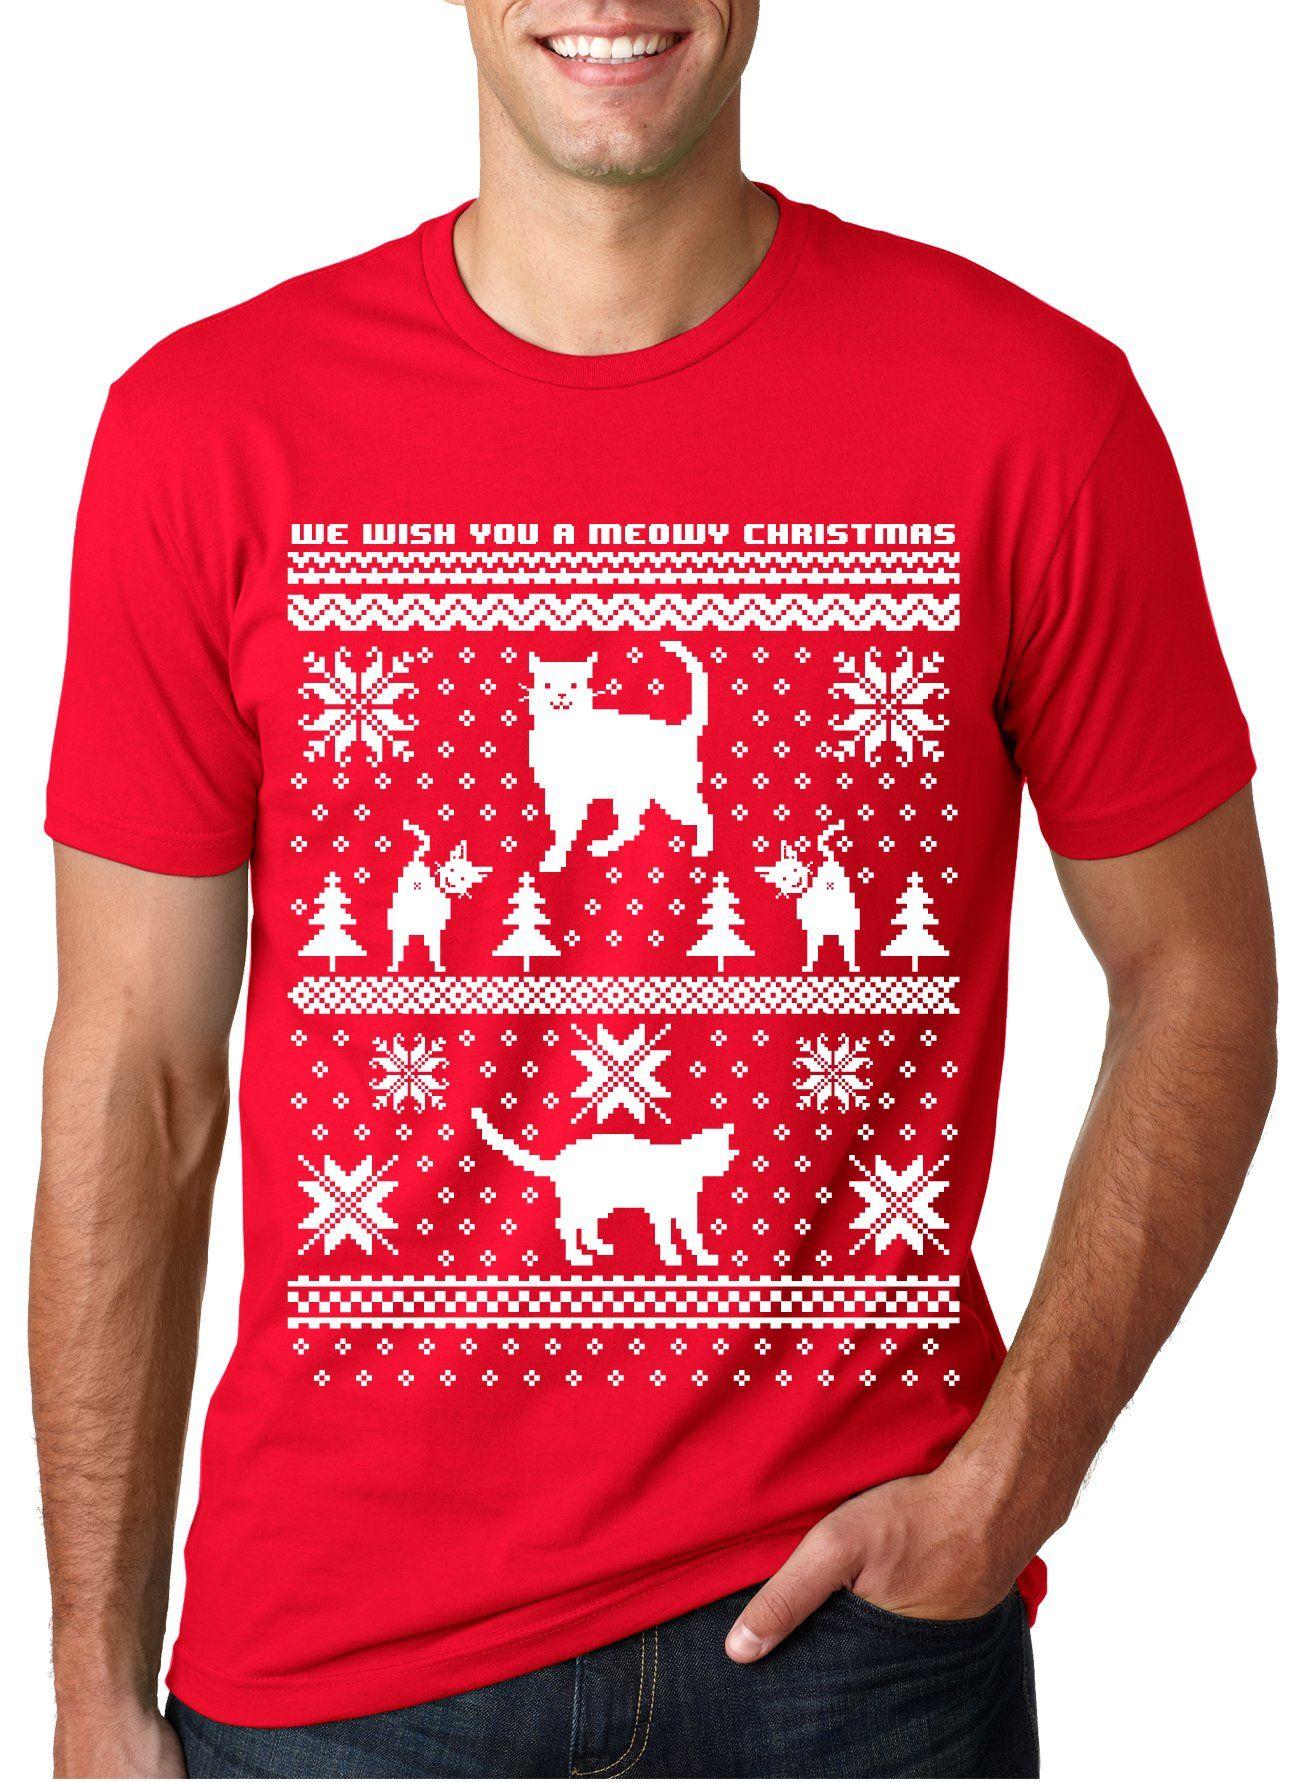 8 Bit Cat Butt T Shirt Funny Ugly Christmas Sweater Shirt